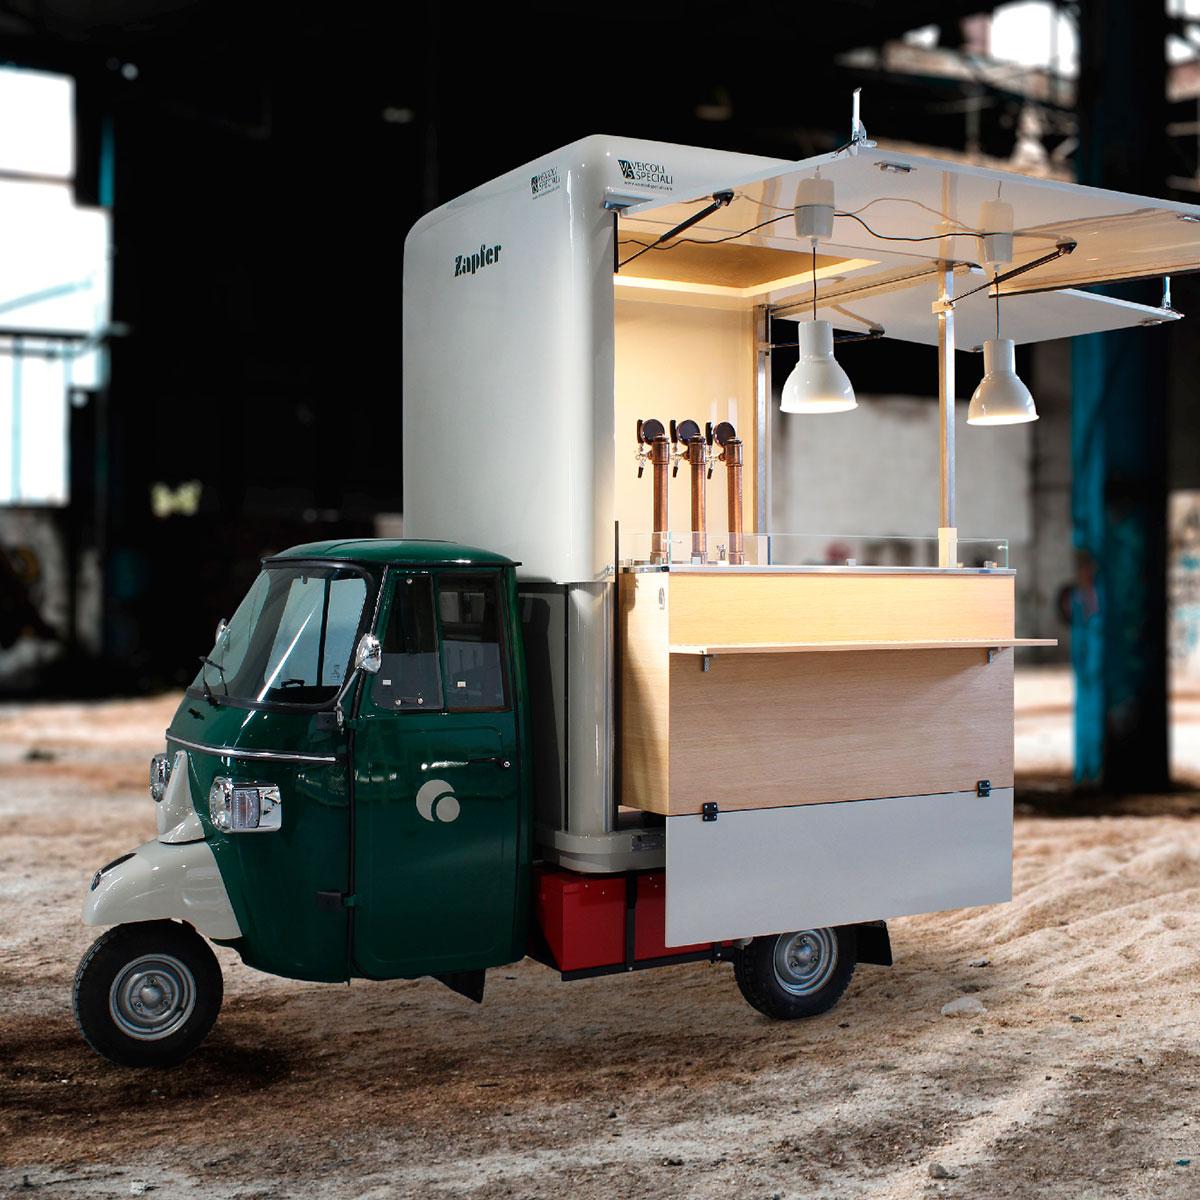 food truck cost of bierwagen brauerei zapfer elektro reflects the quality of the VS set-up